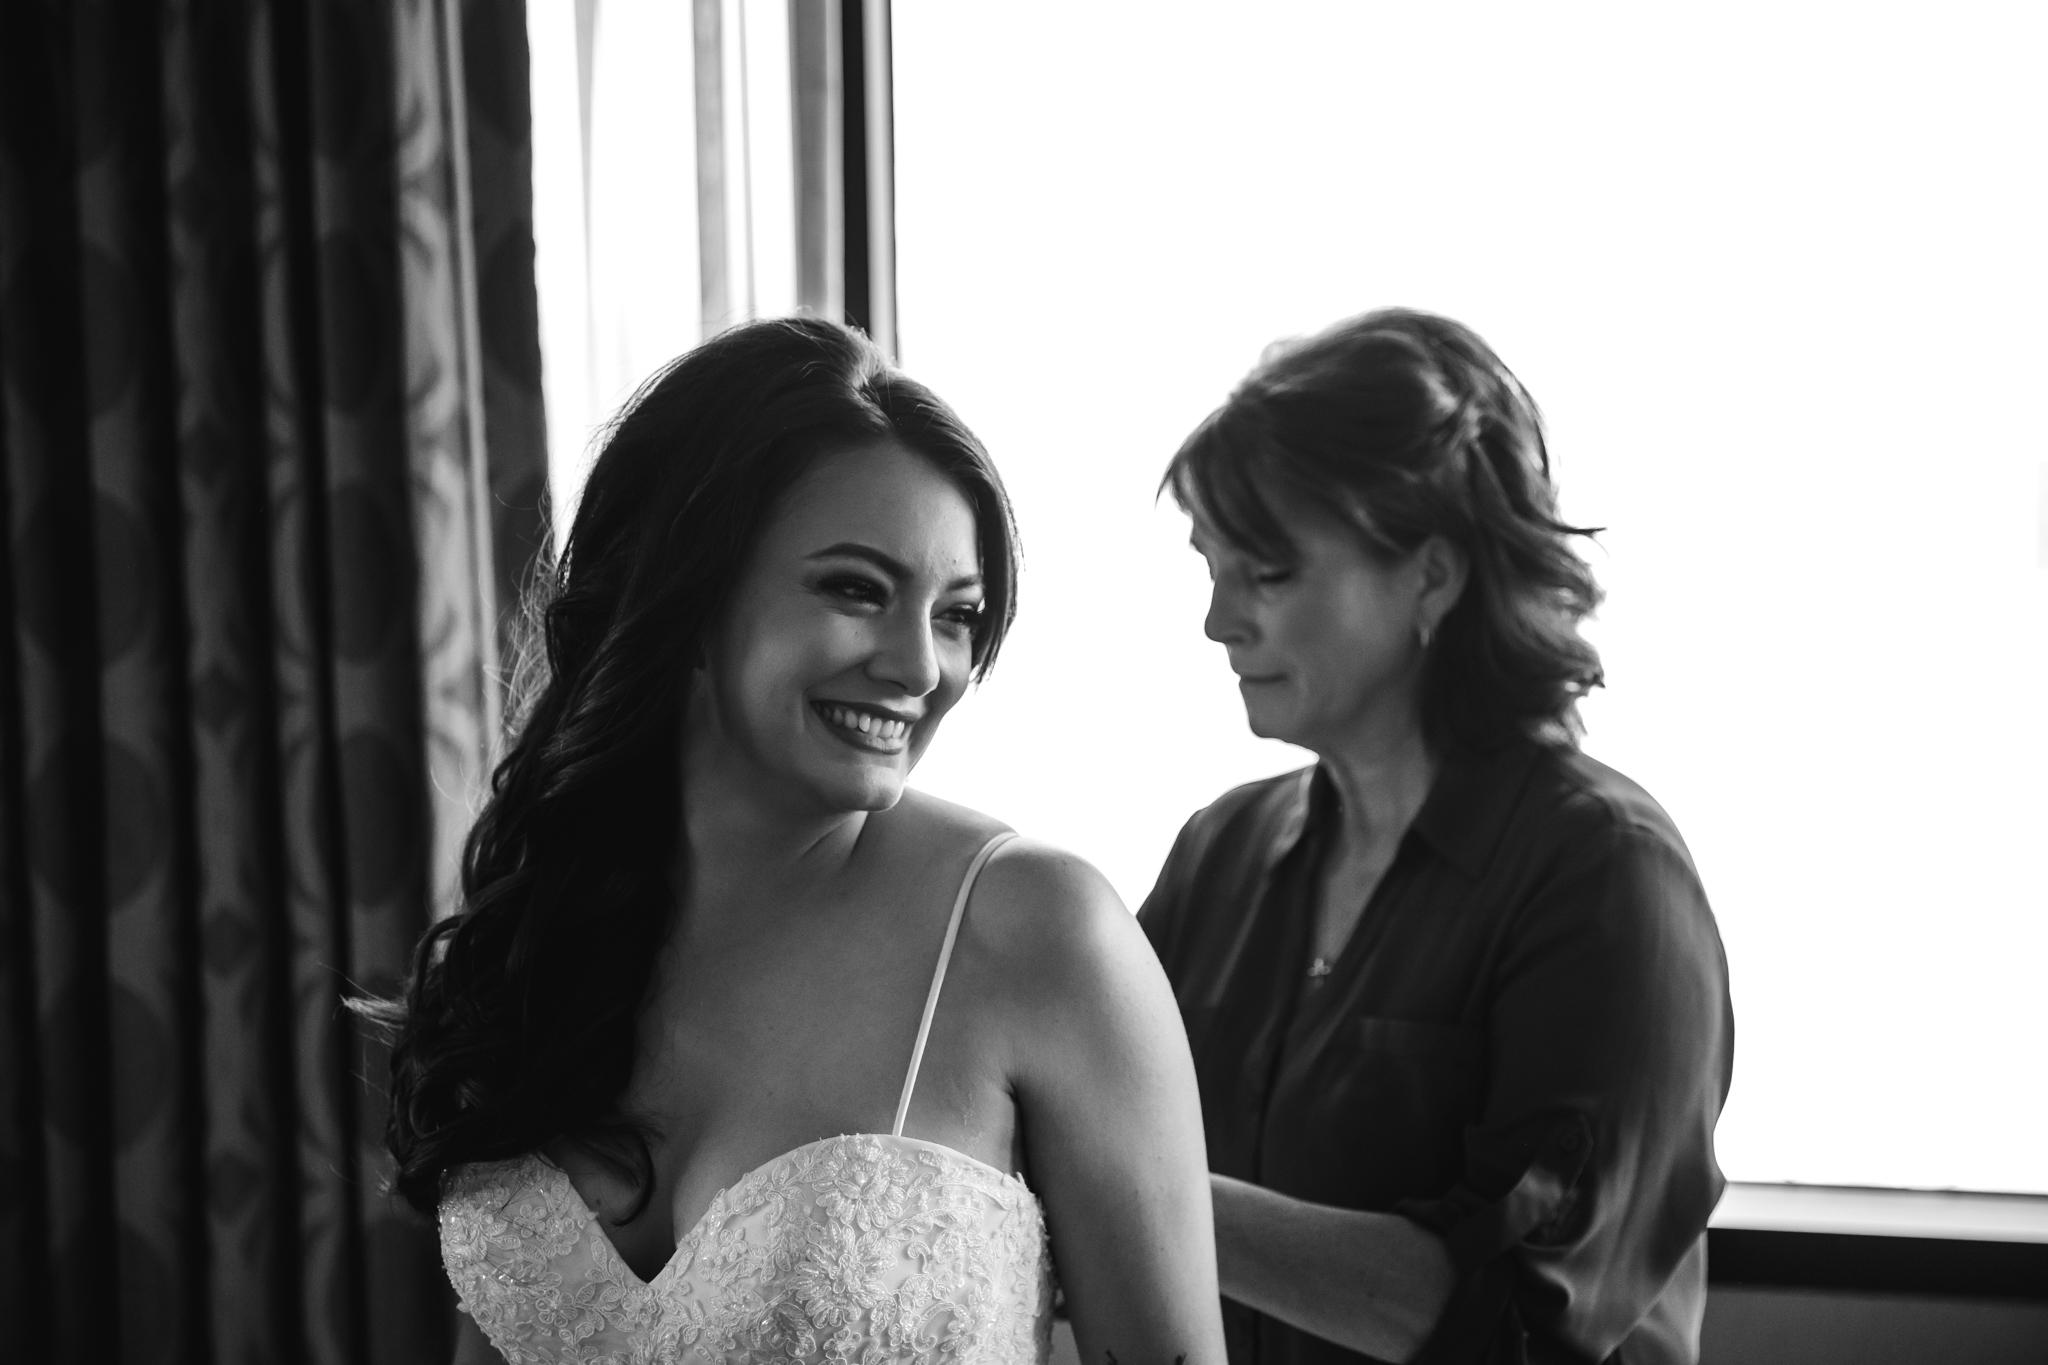 memphis-wedding-photographers-thewarmtharoundyou-ballinese-ballroom (28 of 232).jpg